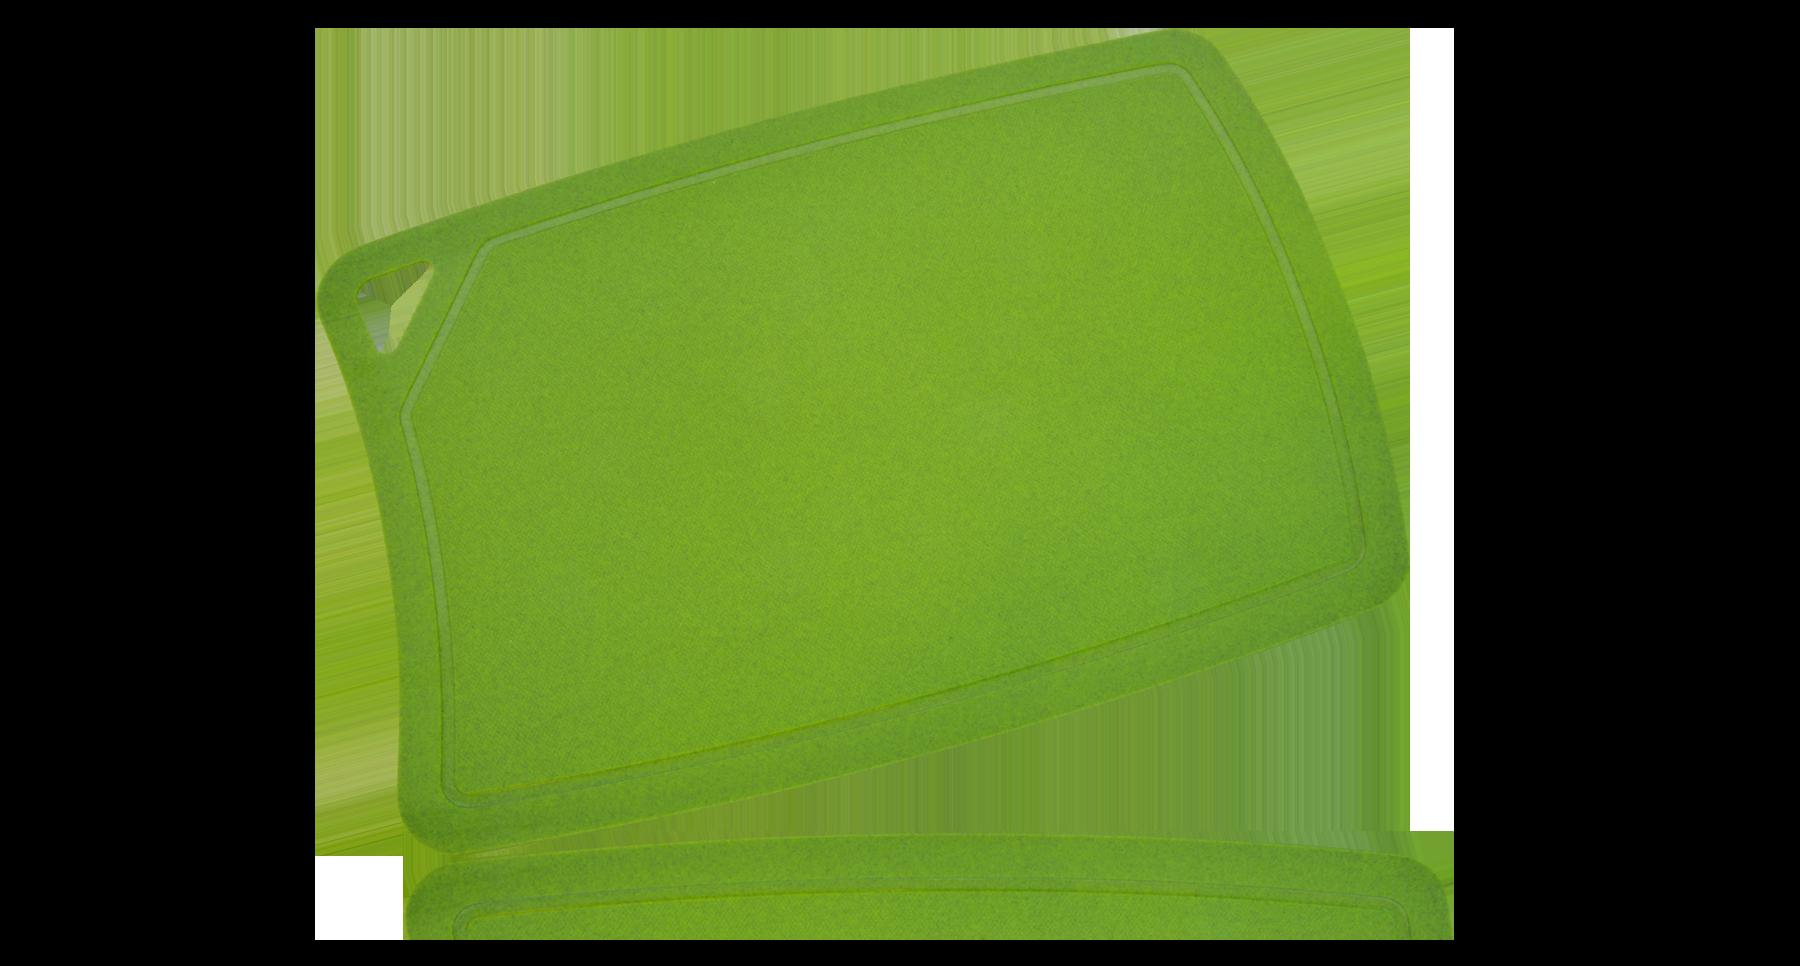 Доска разделочная BIOMAID, термопластичный полиуретан, зеленый, 240x170x2ммTojiro<br>Доска разделочная BIOMAID, термопластичный полиуретан, зеленый, 240x170x2мм<br>